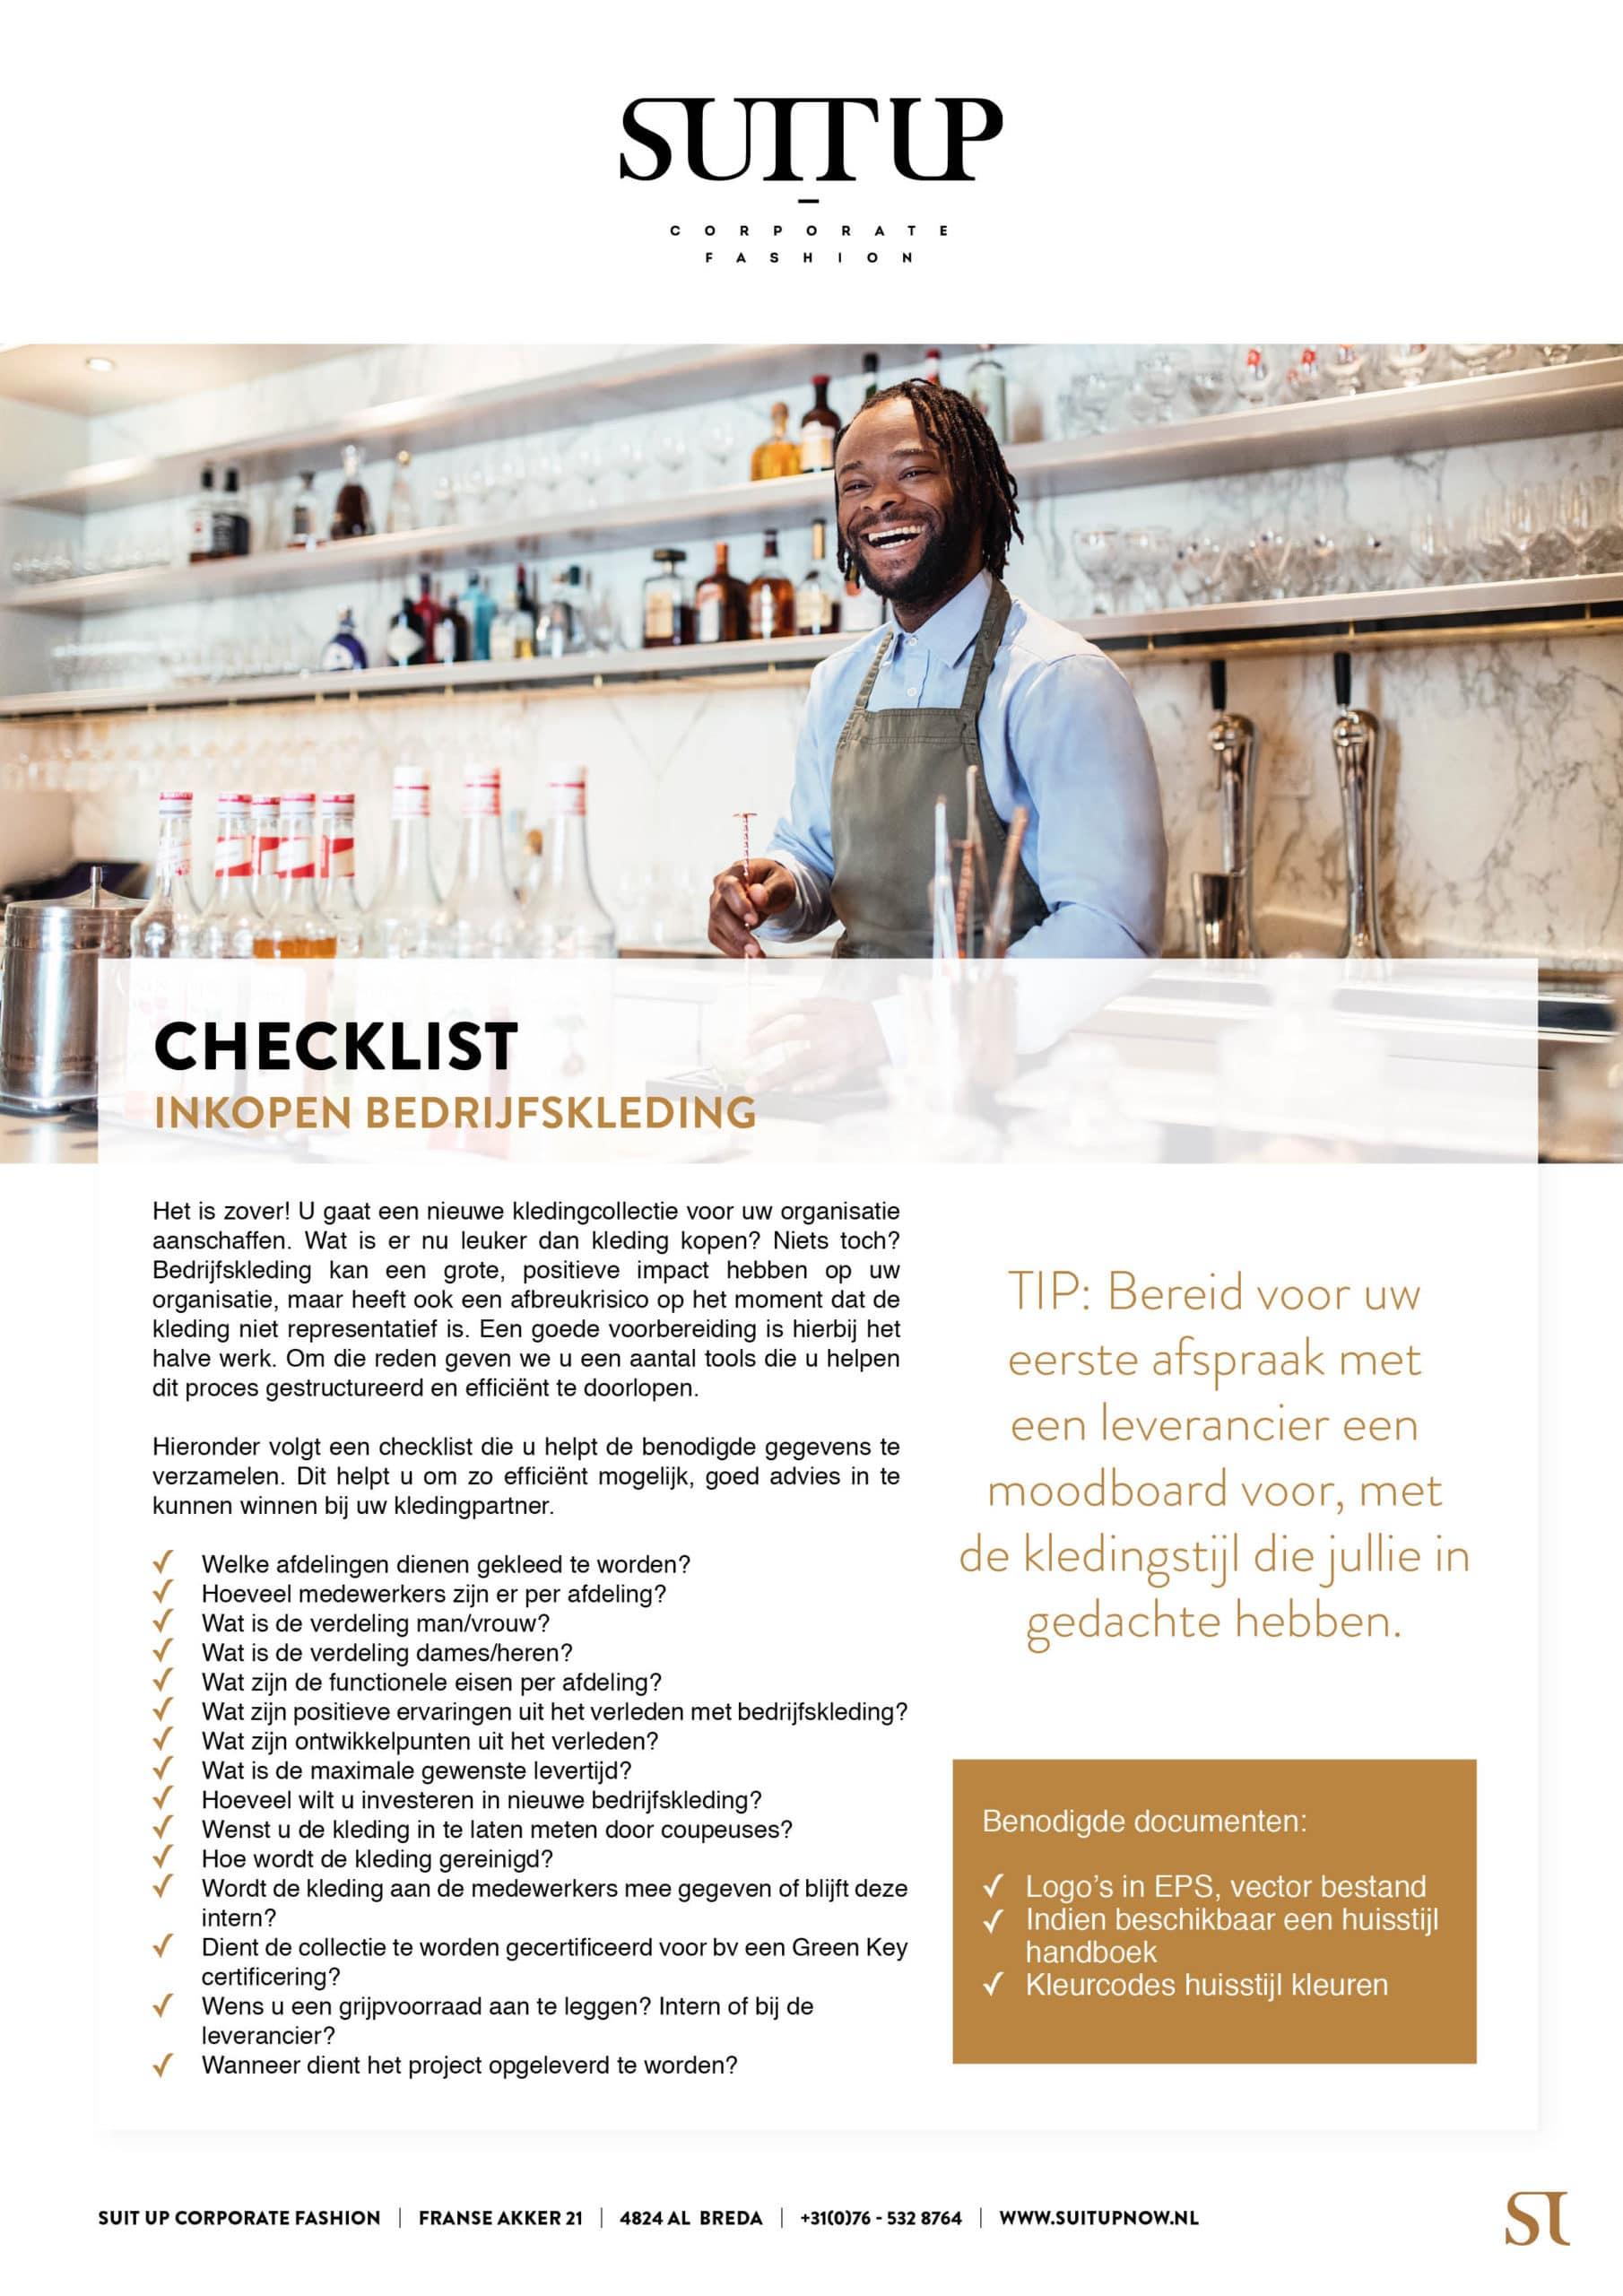 Checklist inkopen bedrijfskleding